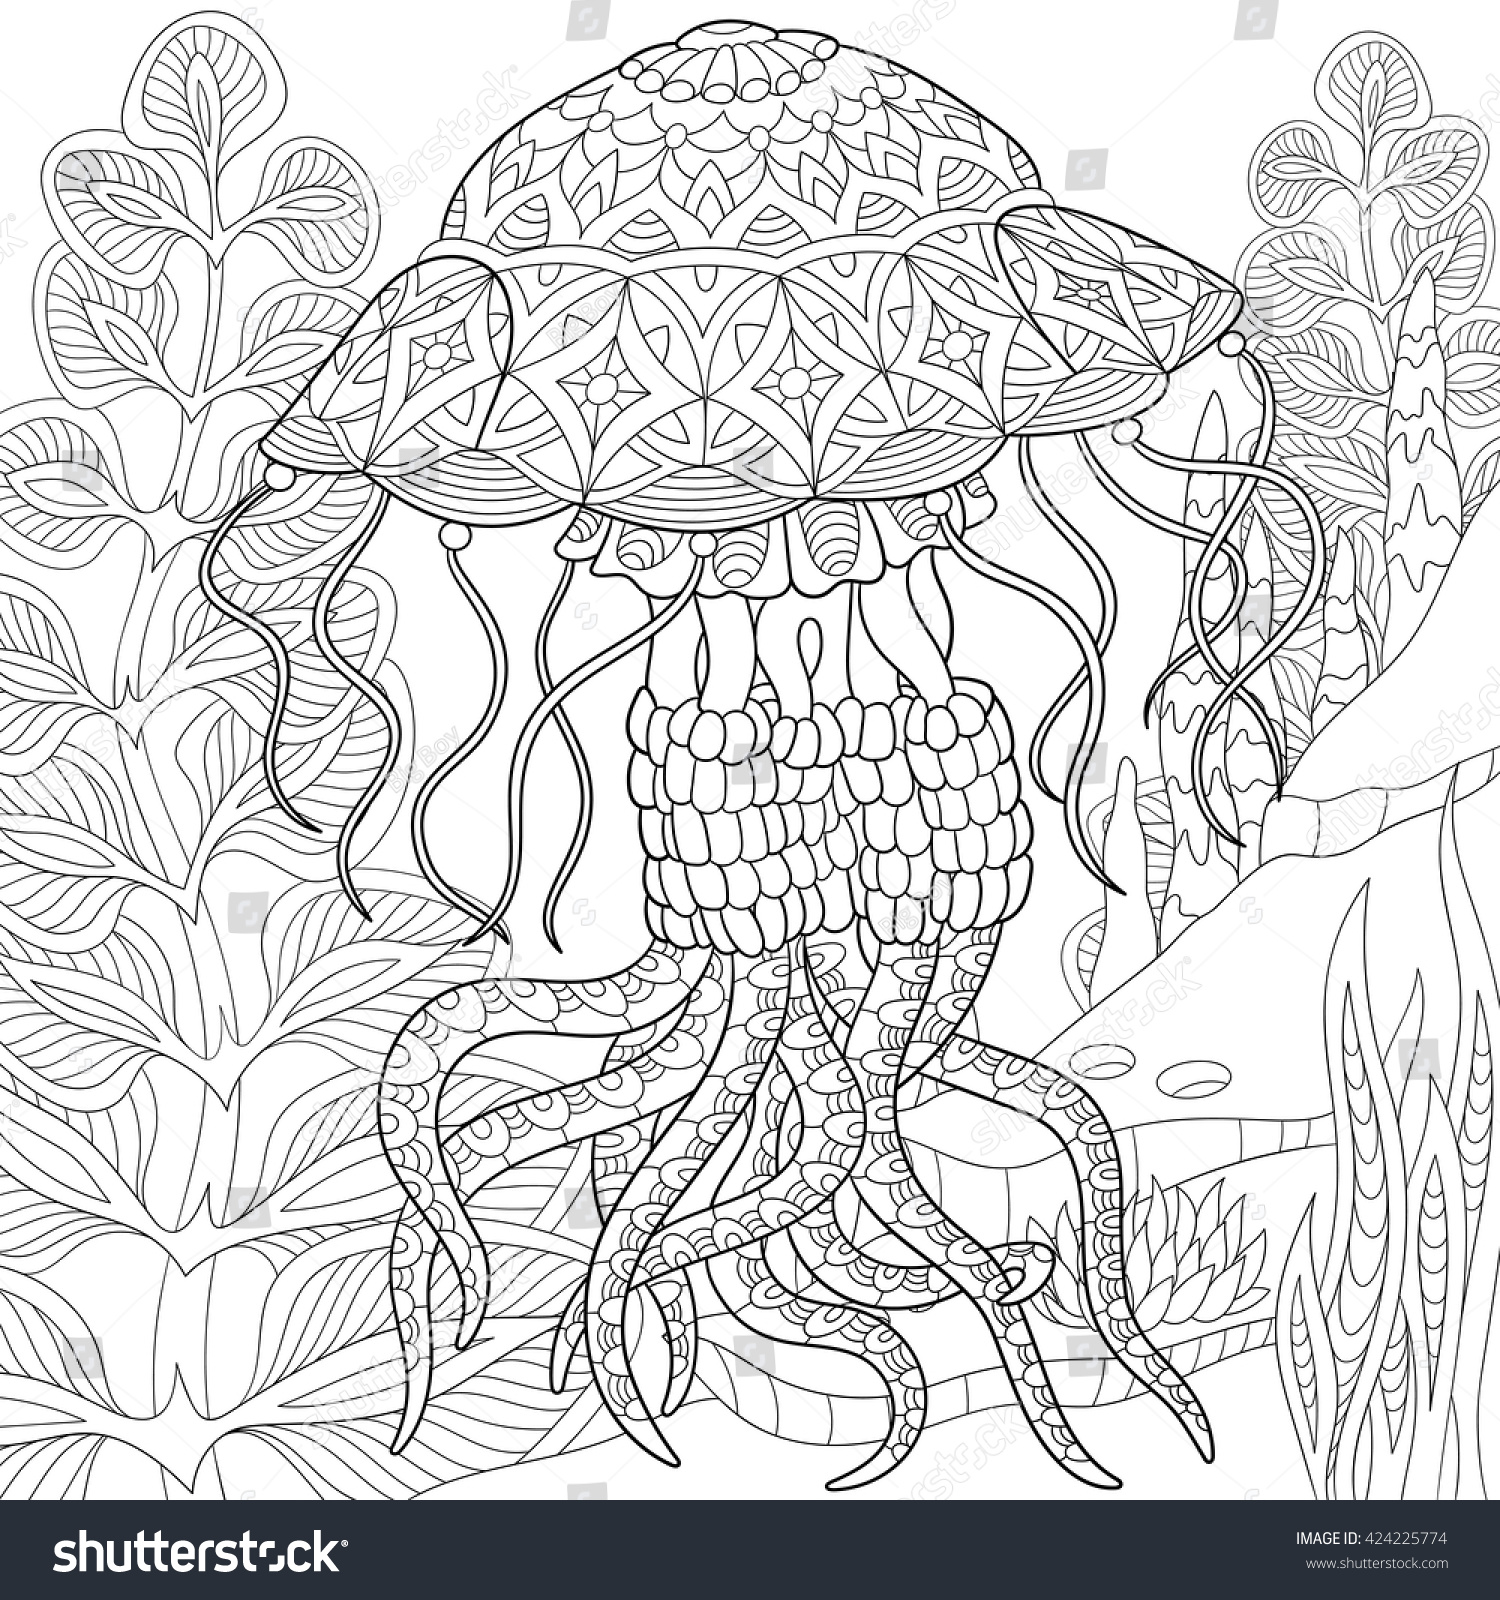 zentangle stylized cartoon jellyfish swimming among stock vector